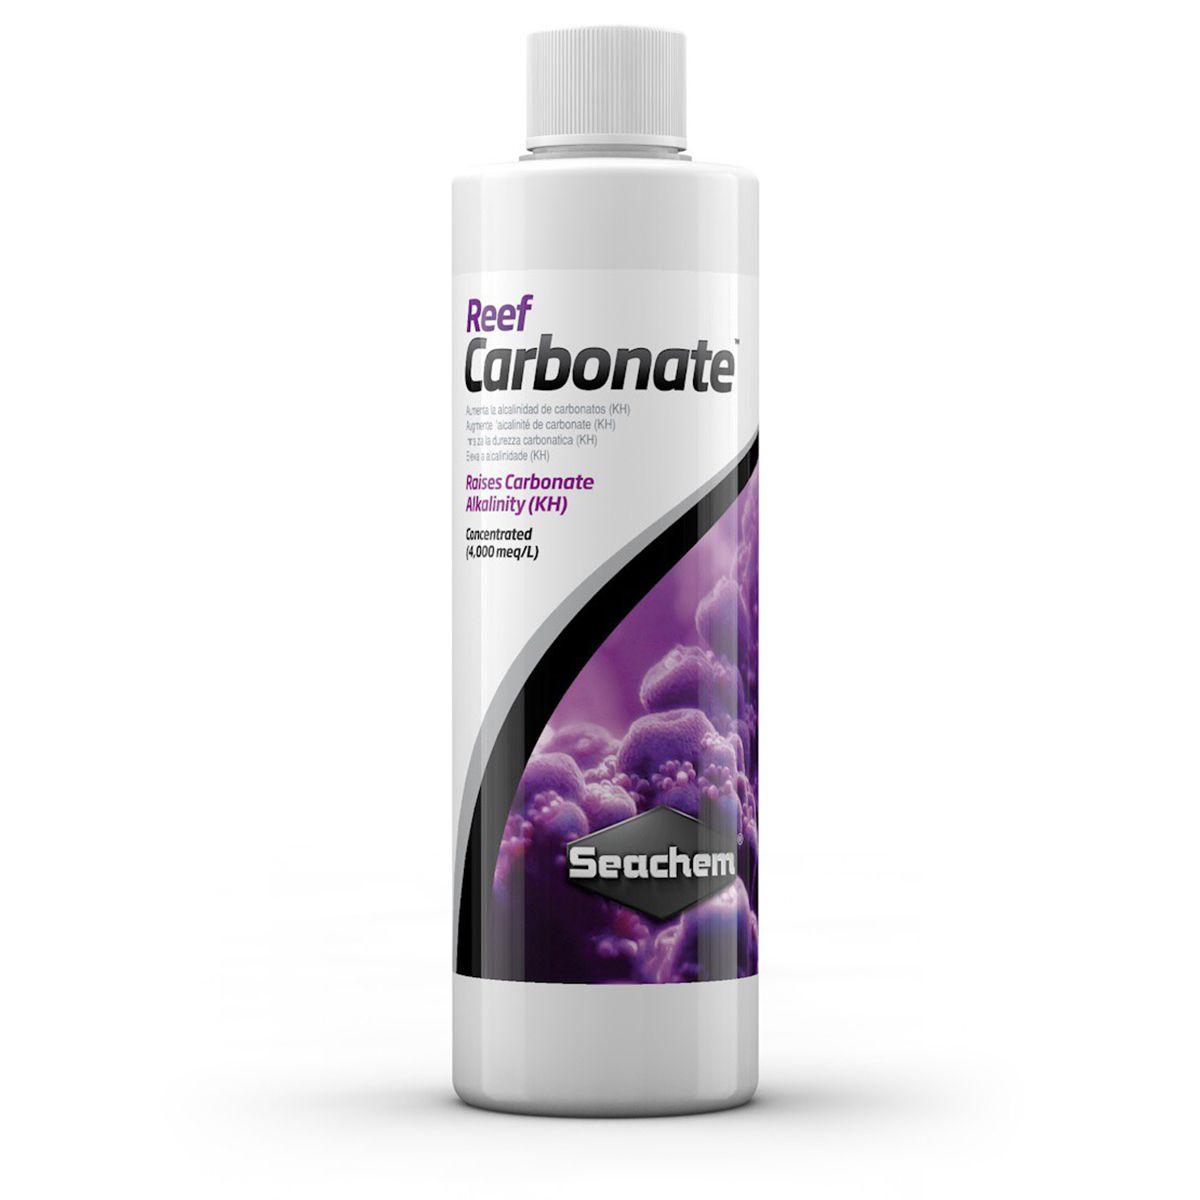 Seachem Reef Carbonate 250ml Concentrado de Carbonato